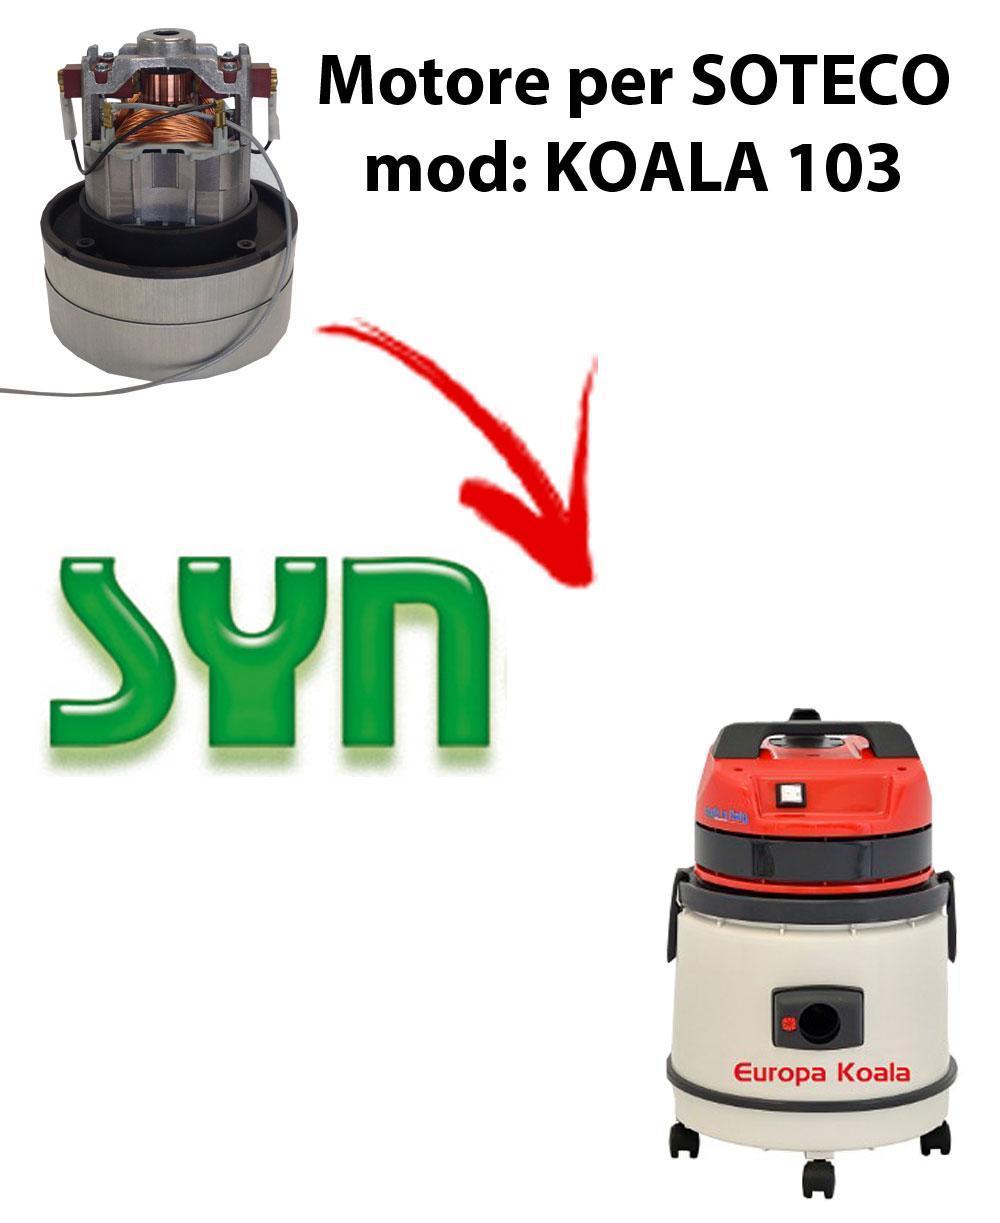 KOALA 103 automatic MOTORE SYN aspirazione para aspiradora SOTECO